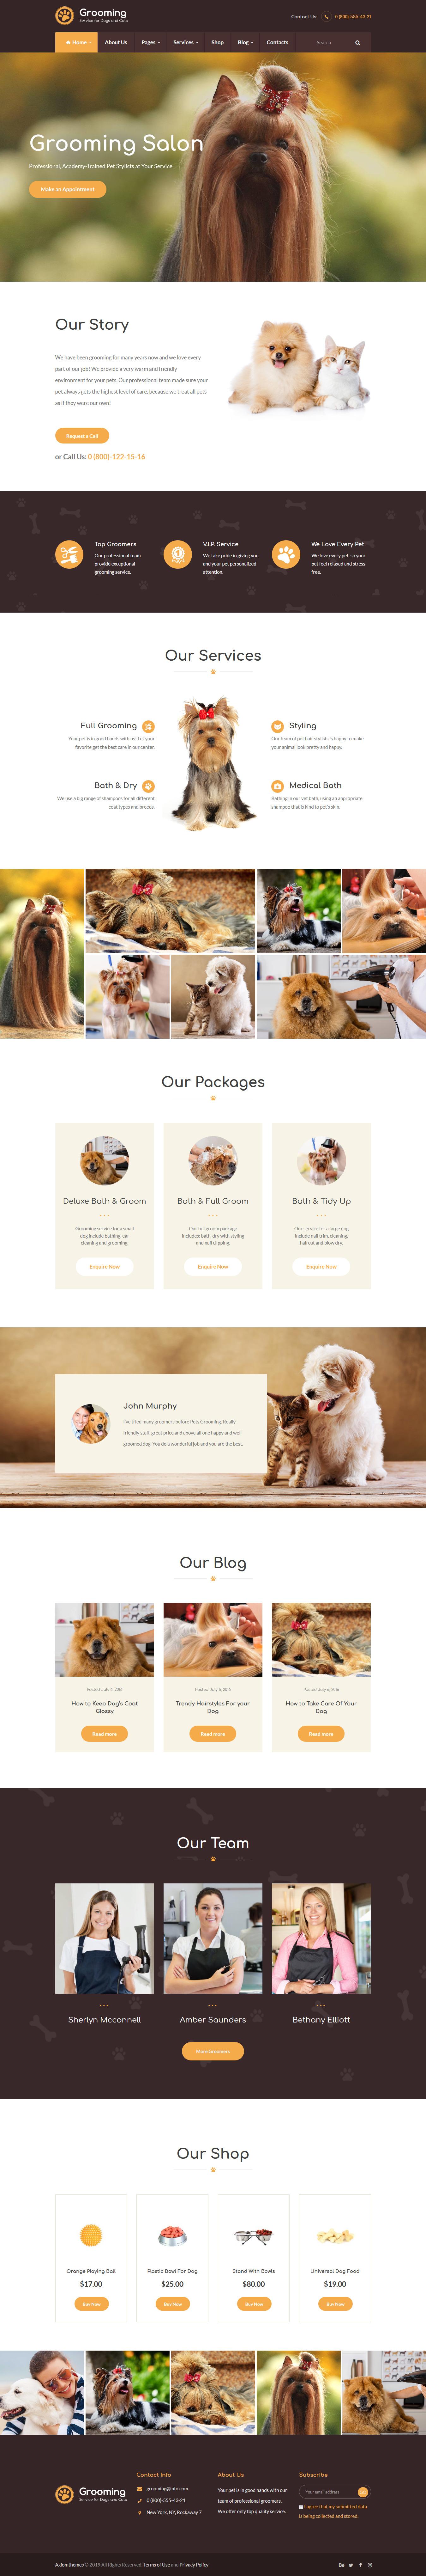 pet grooming best premium animal and pet wordpress theme - 10+ Best Premium Animal and Pet WordPress Themes